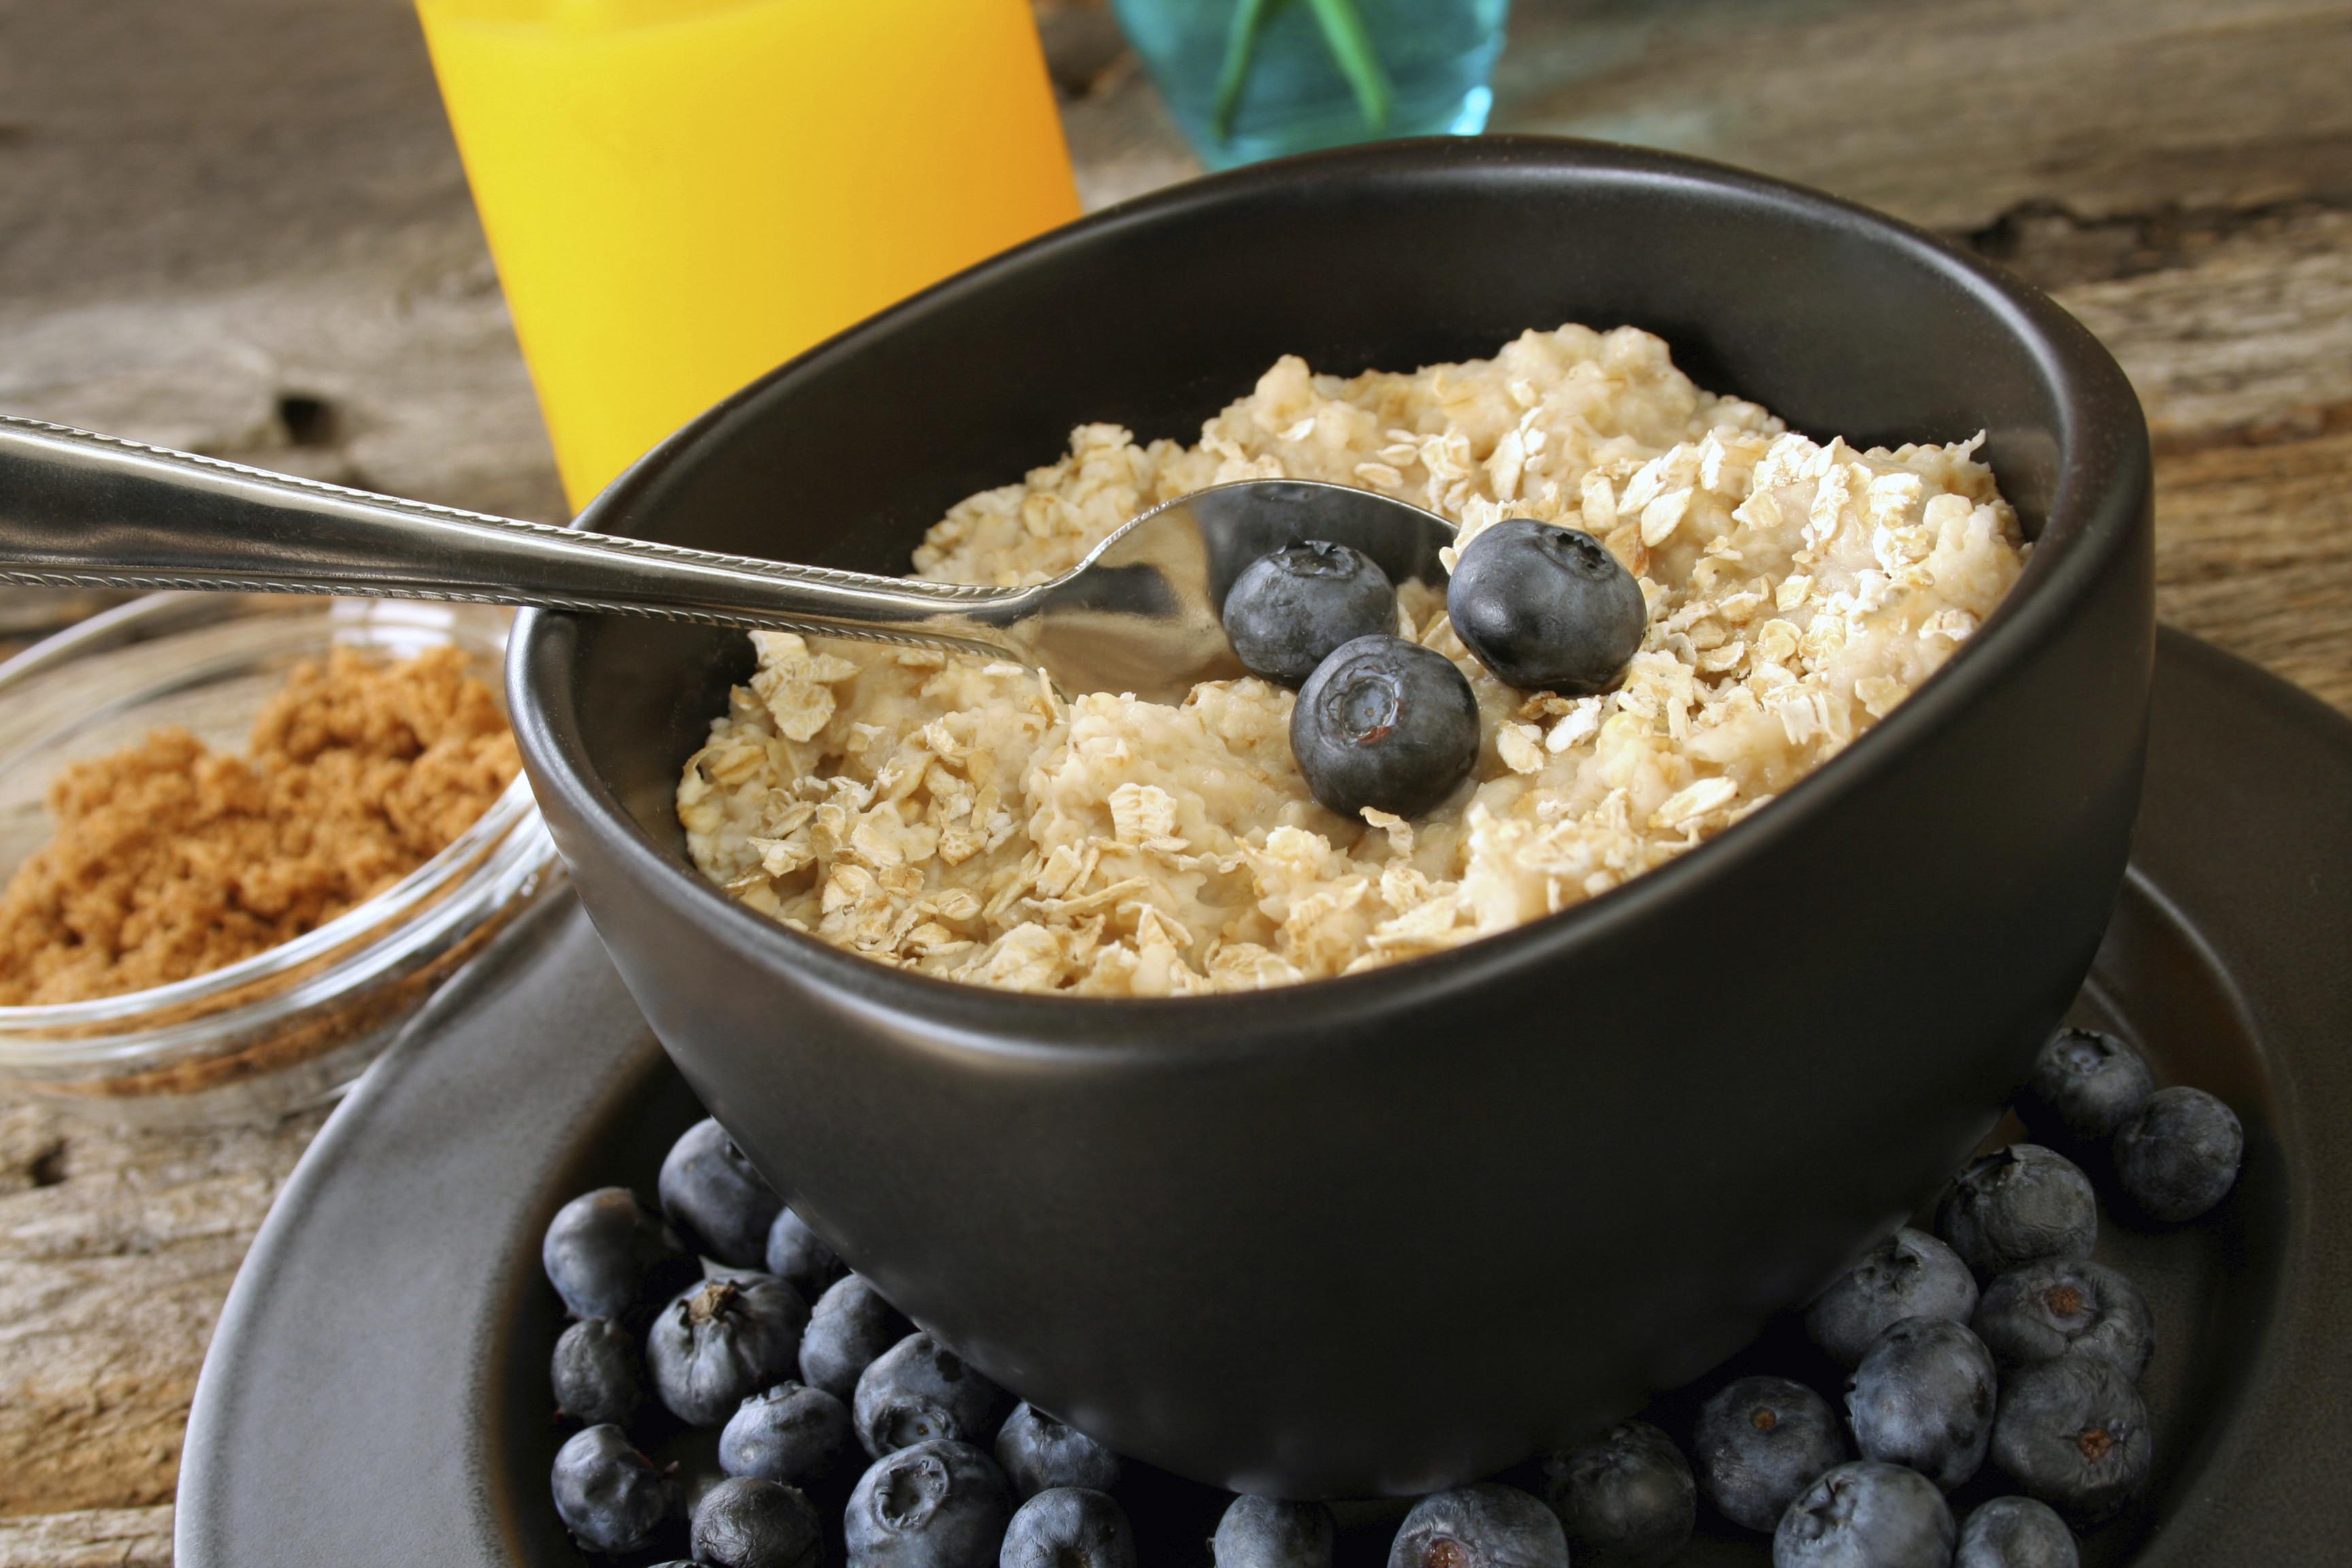 Healthy Oatmeal Breakfast  Top Strategies to Get Kids to Eat Oatmeal